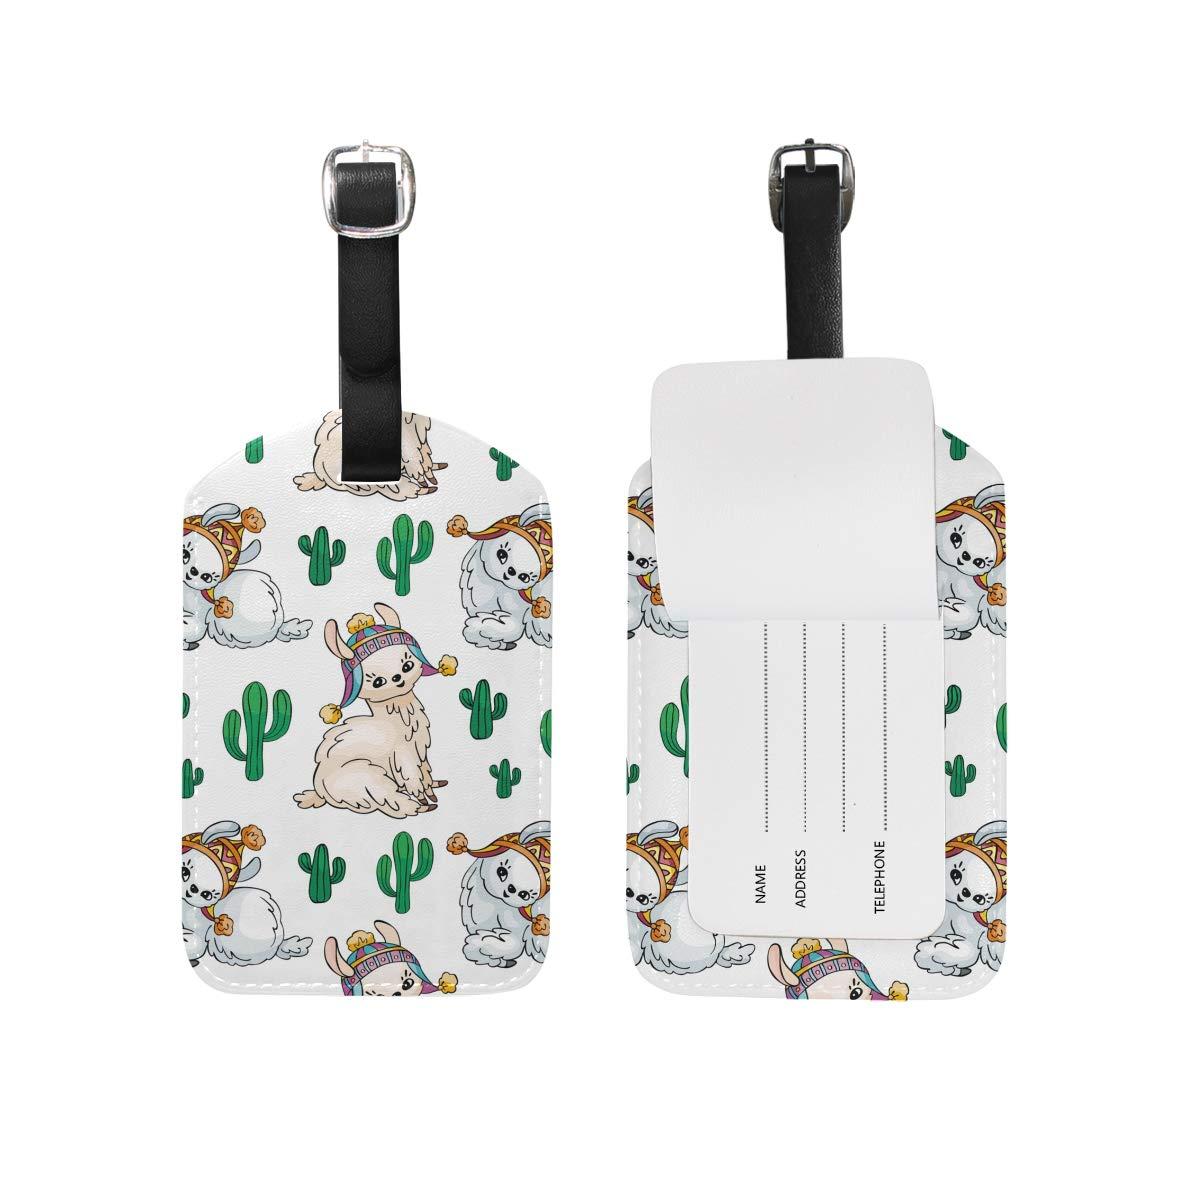 Saobao Travel Luggage Tag Beautiful Unicorns PU Leather Baggage Suitcase Travel ID Bag Tag 1Pcs